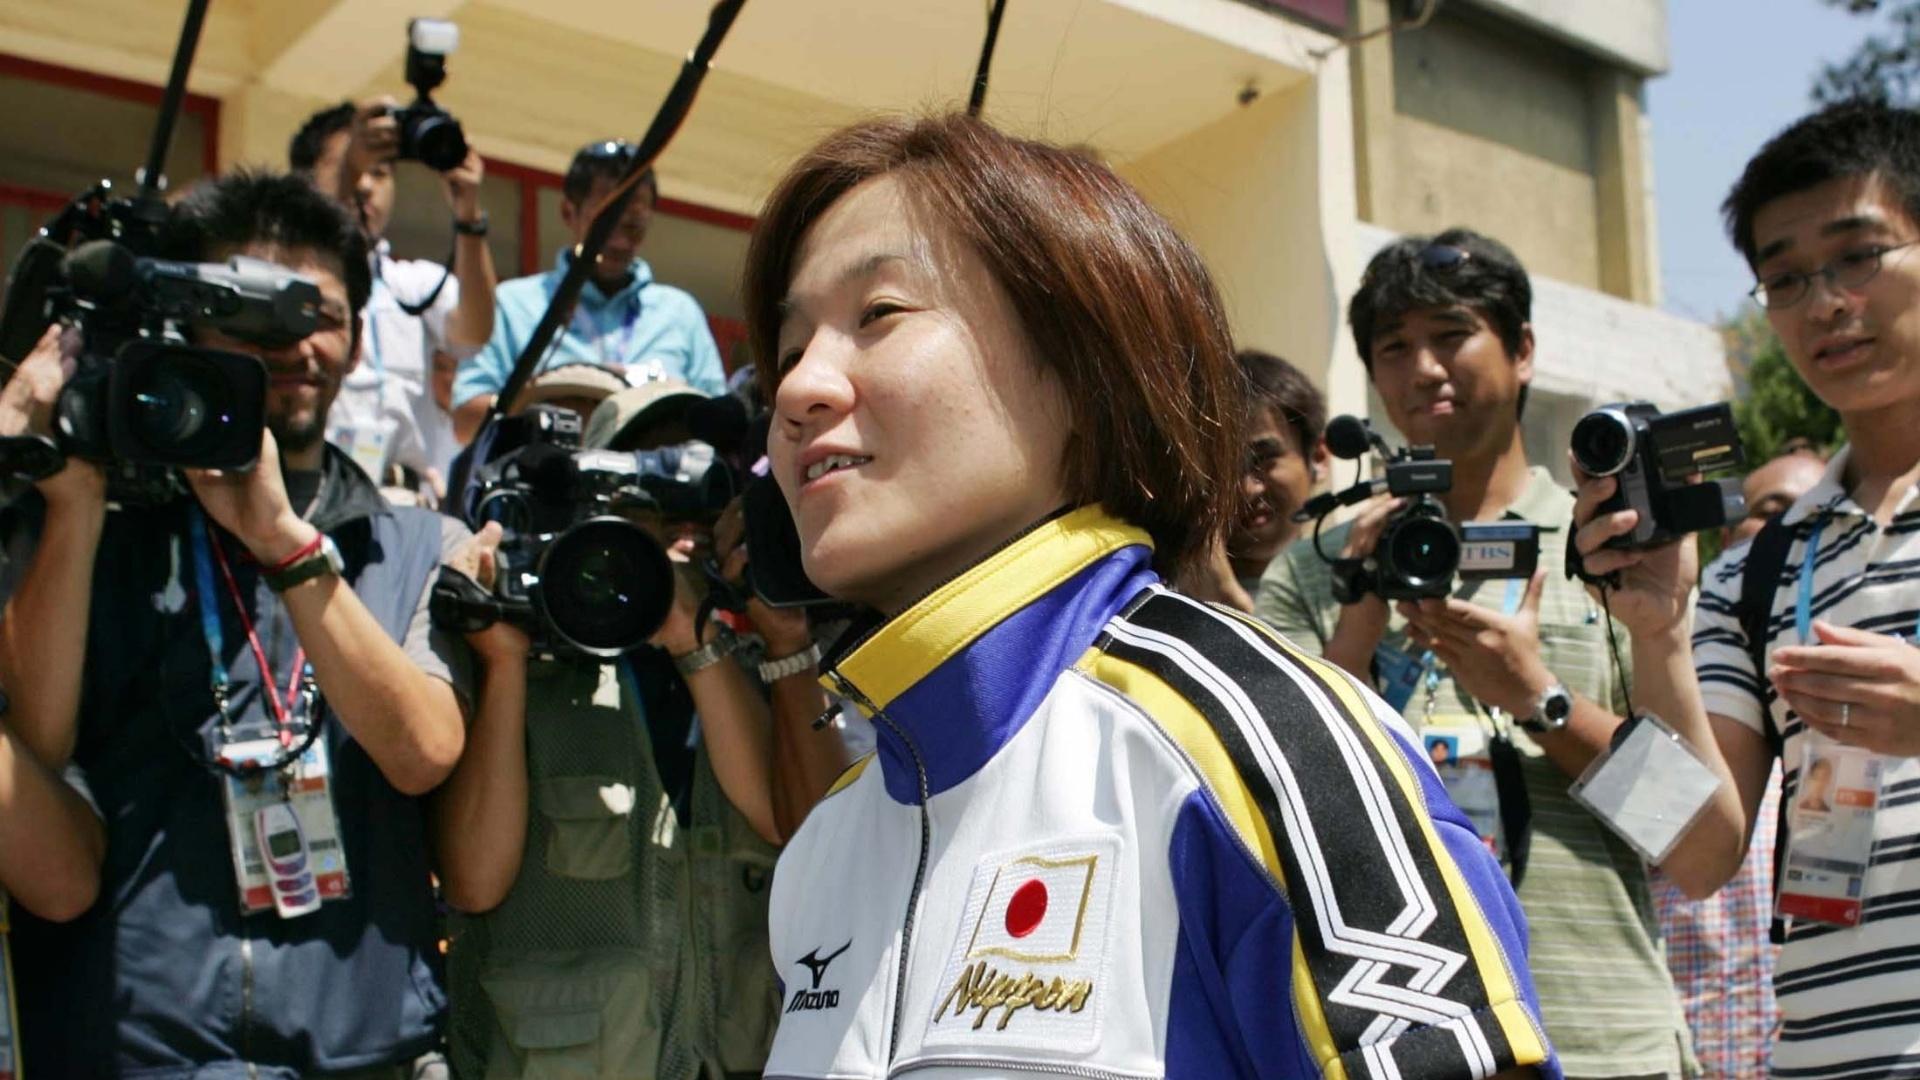 13.ago.2014 - Judoca Ryoko Tamura Tani é fotografada após treino em Atenas para a Olimpíada